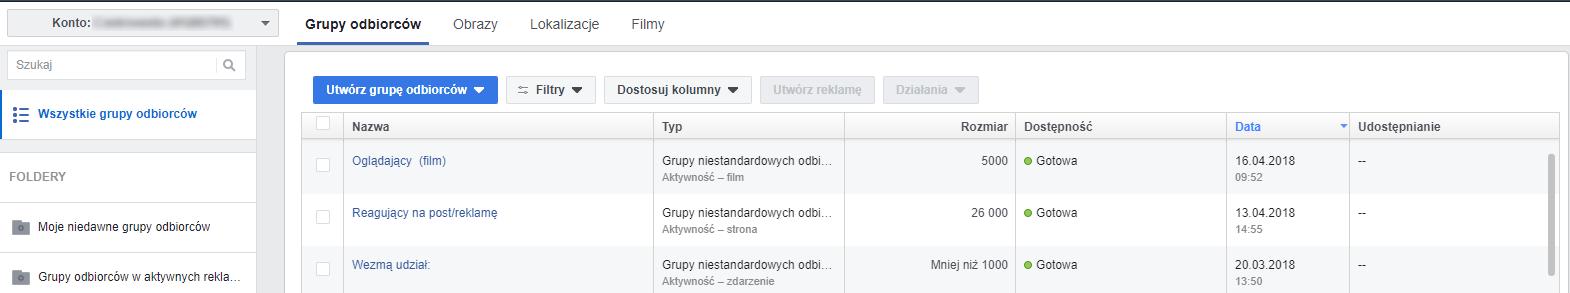 Grupy odbiorców Facebook